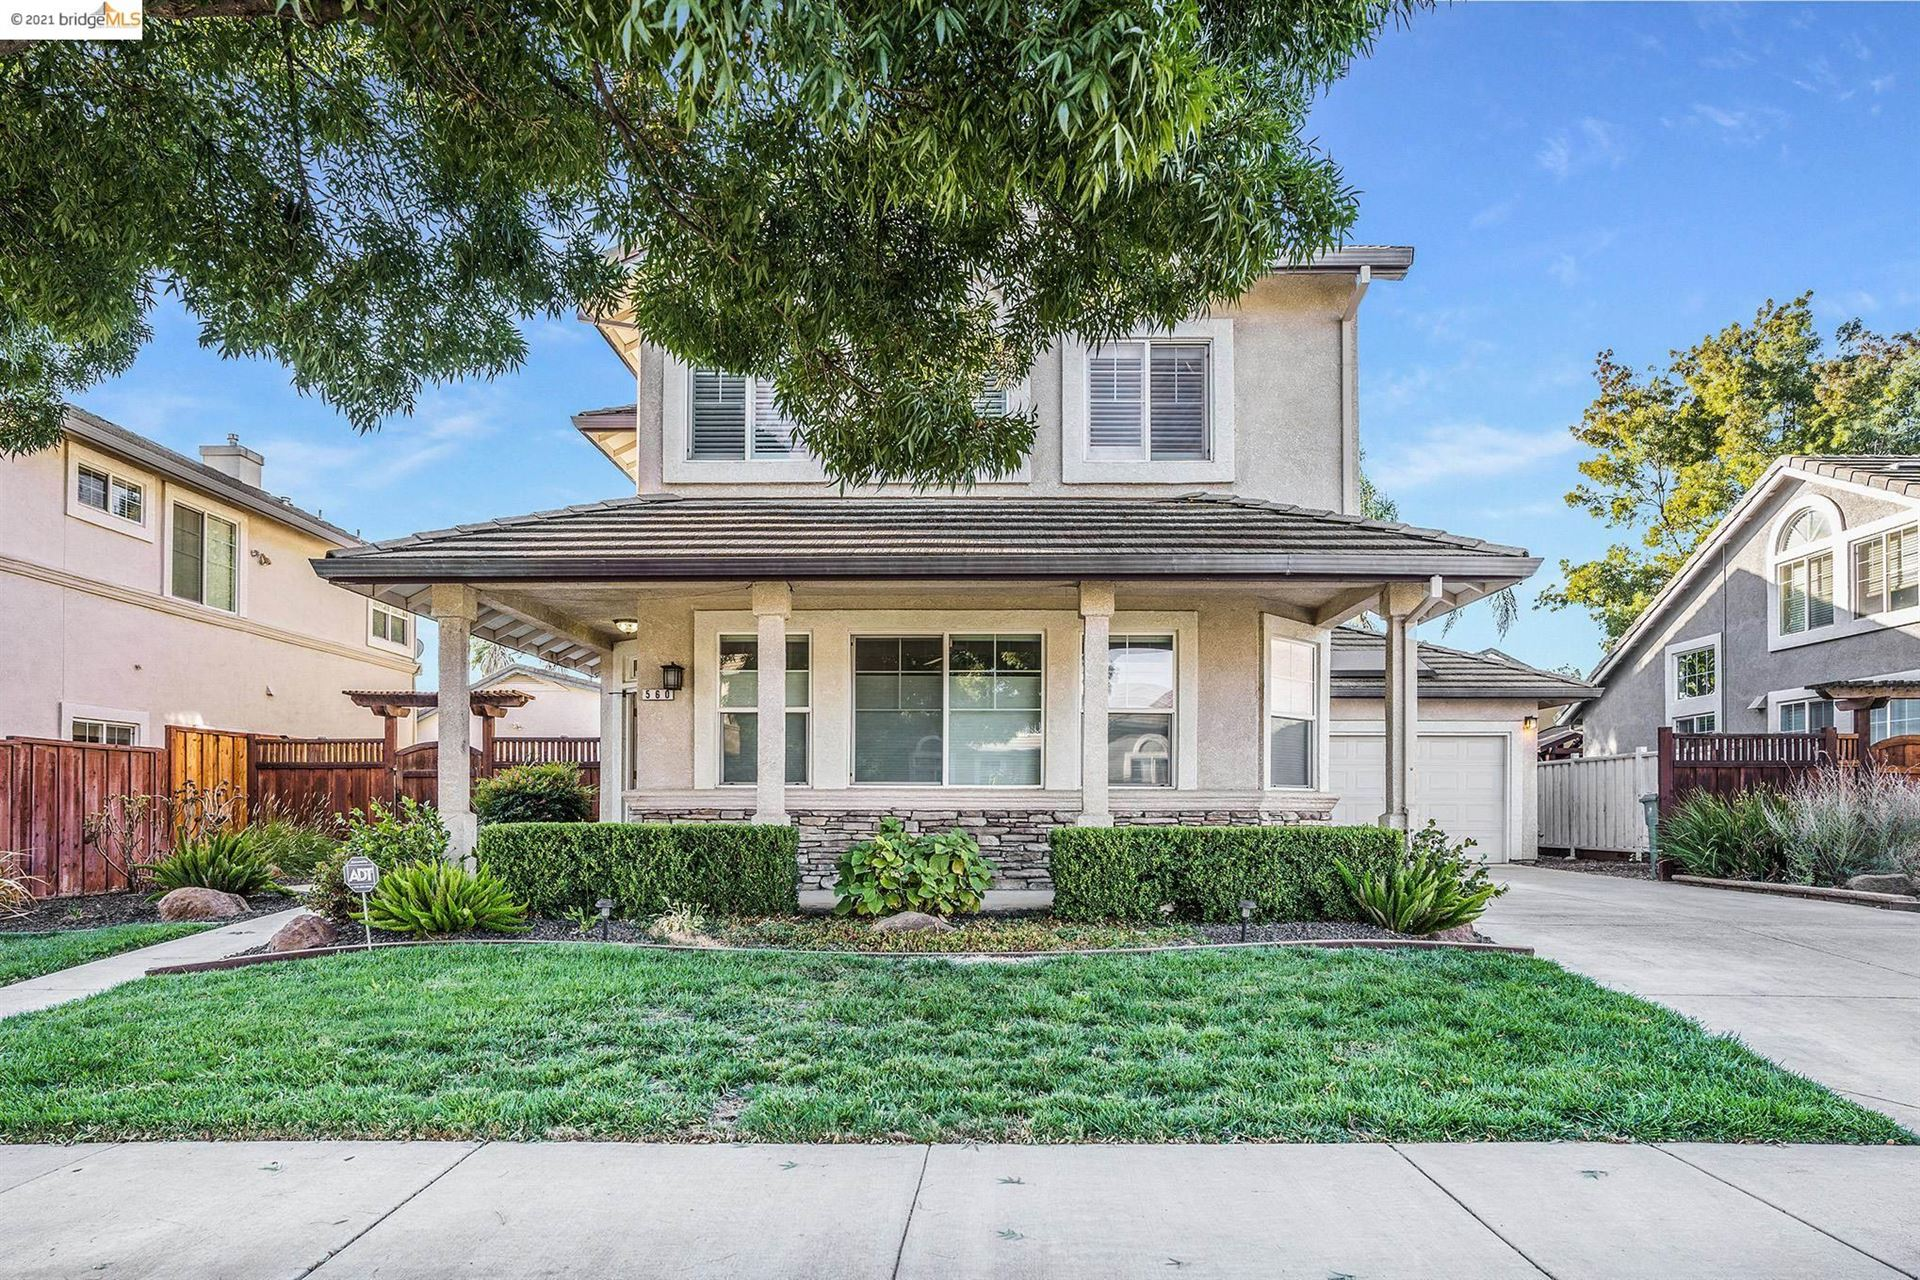 Photo of 560 Birchwood Rd, Brentwood, CA 94513 (MLS # 40970613)